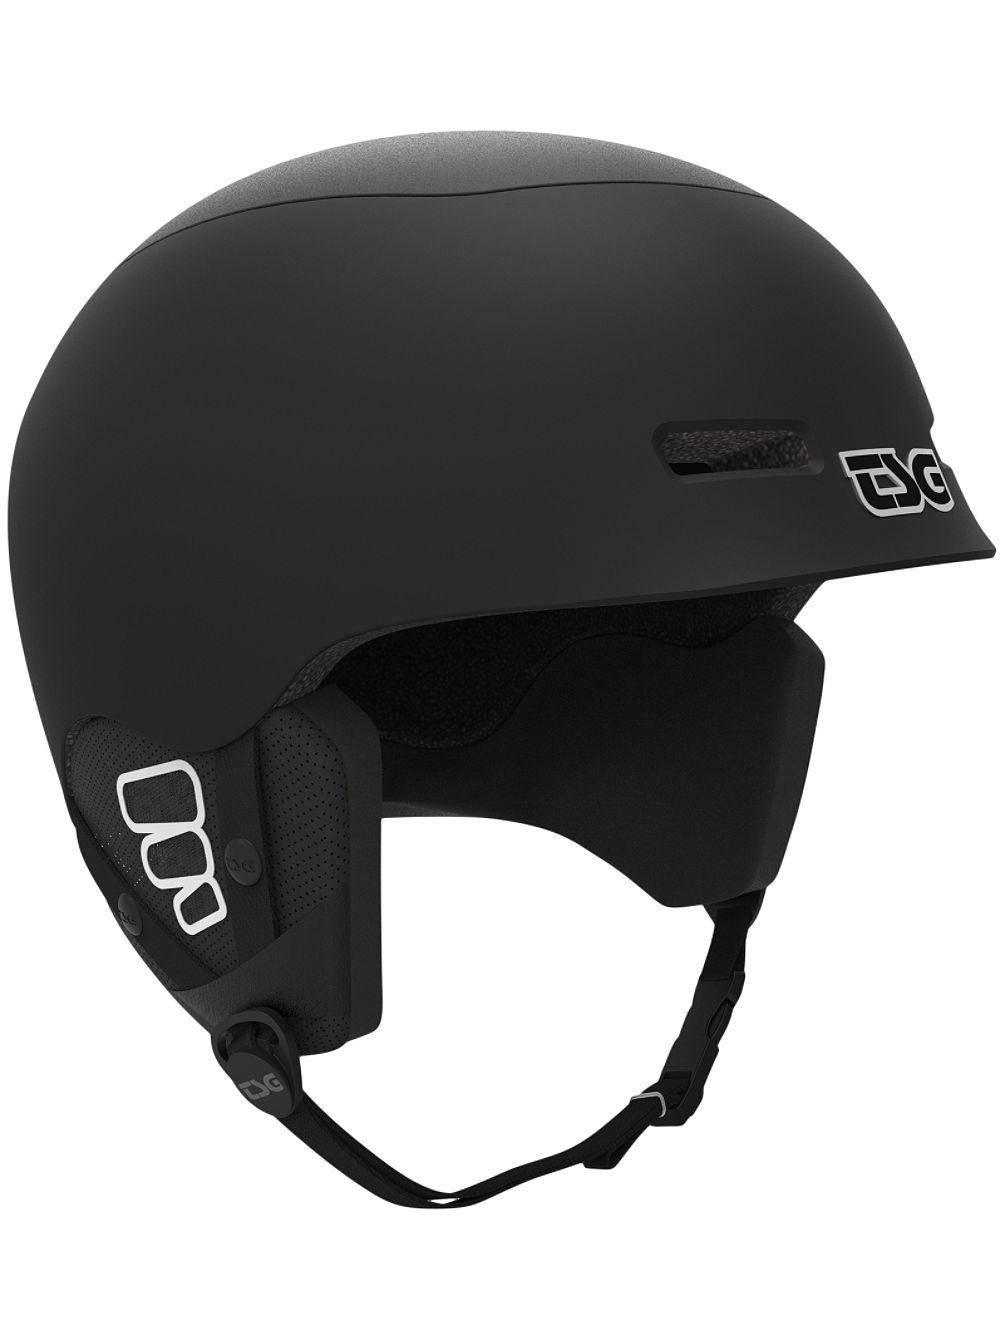 tsg-konik-solid-color-helmet